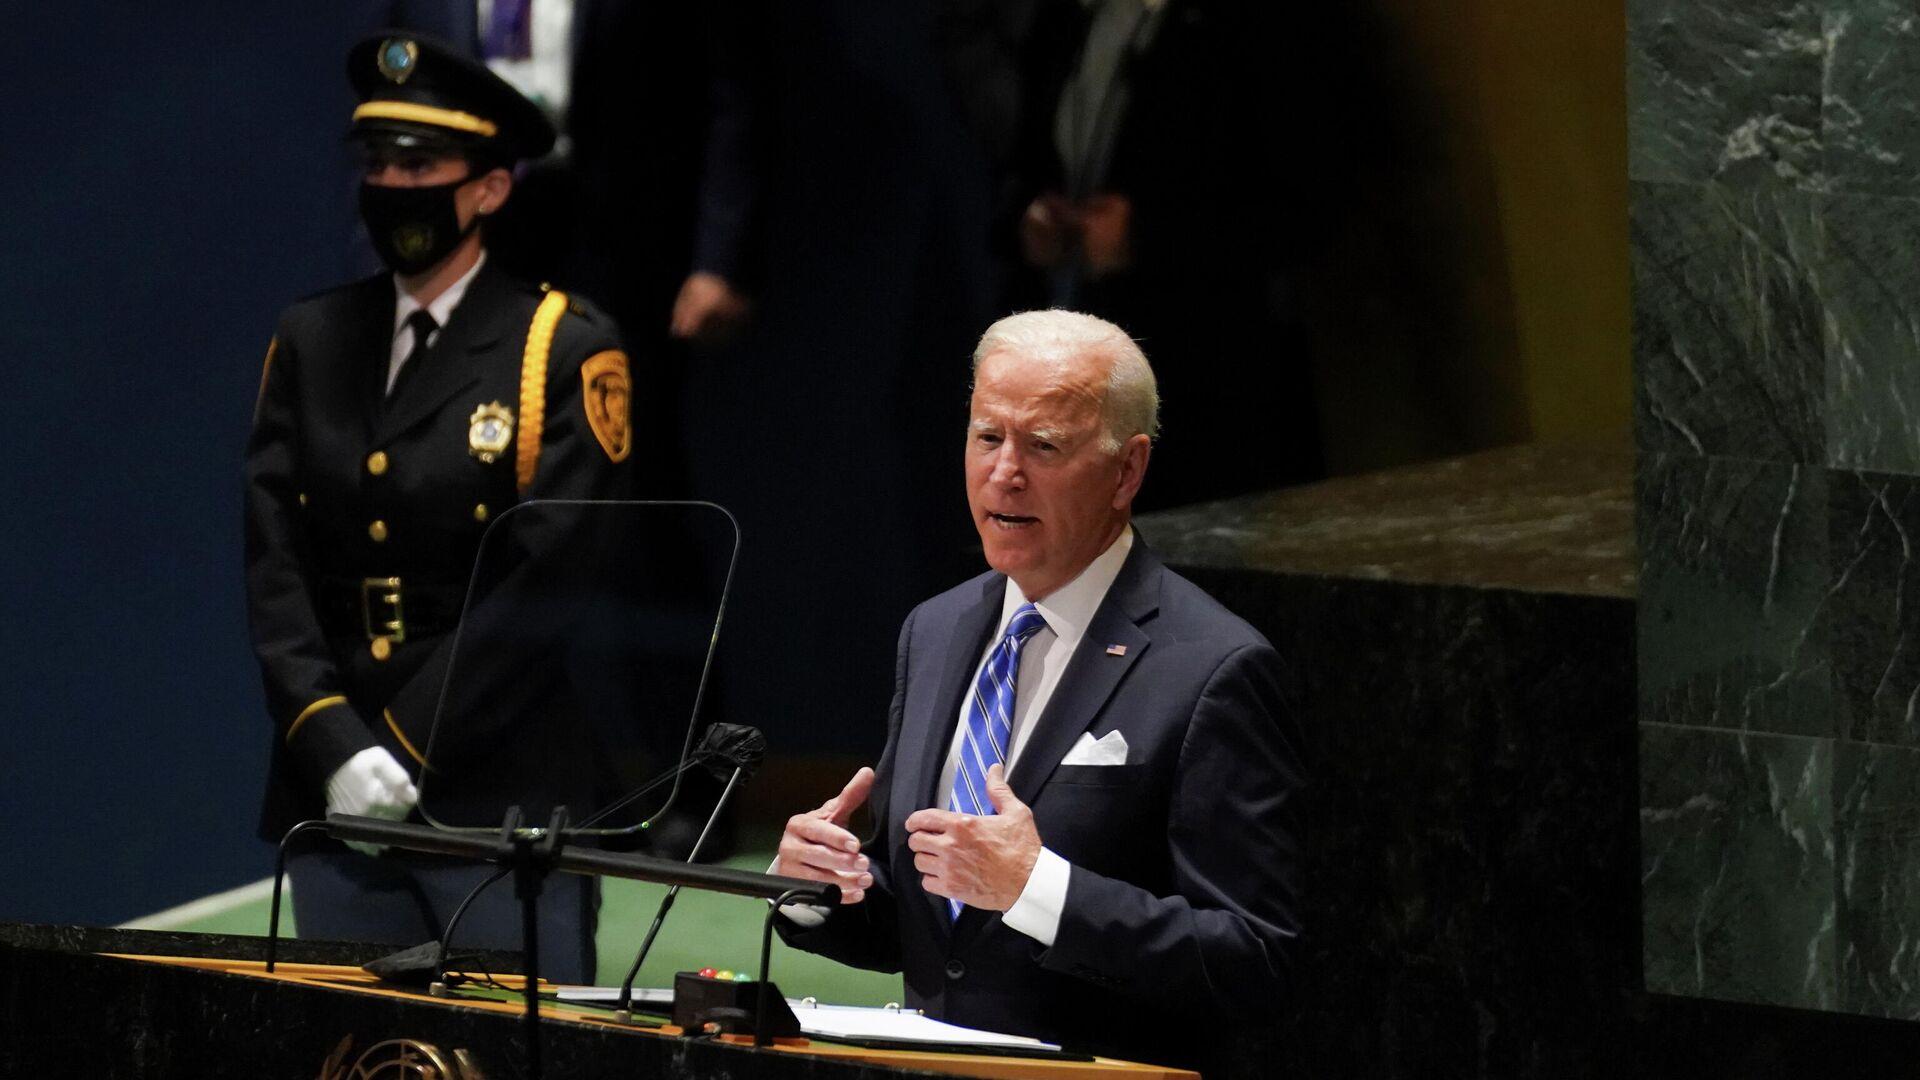 U.S. President Joe Biden addresses the 76th Session of the U.N. General Assembly in New York City, U.S., September 21, 2021. - Sputnik International, 1920, 21.09.2021